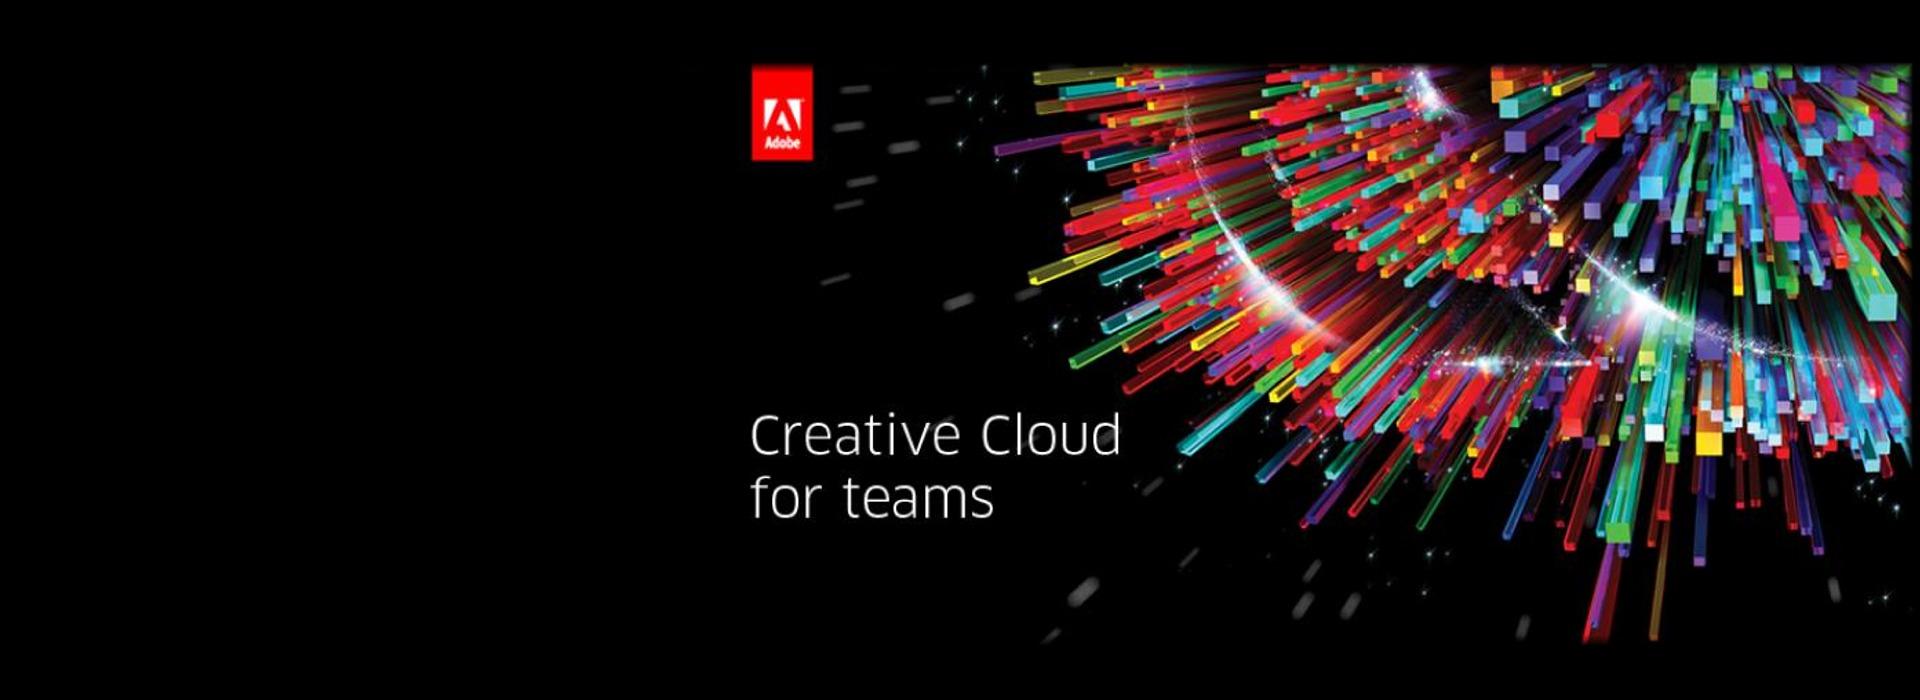 Creative Cloud for teams